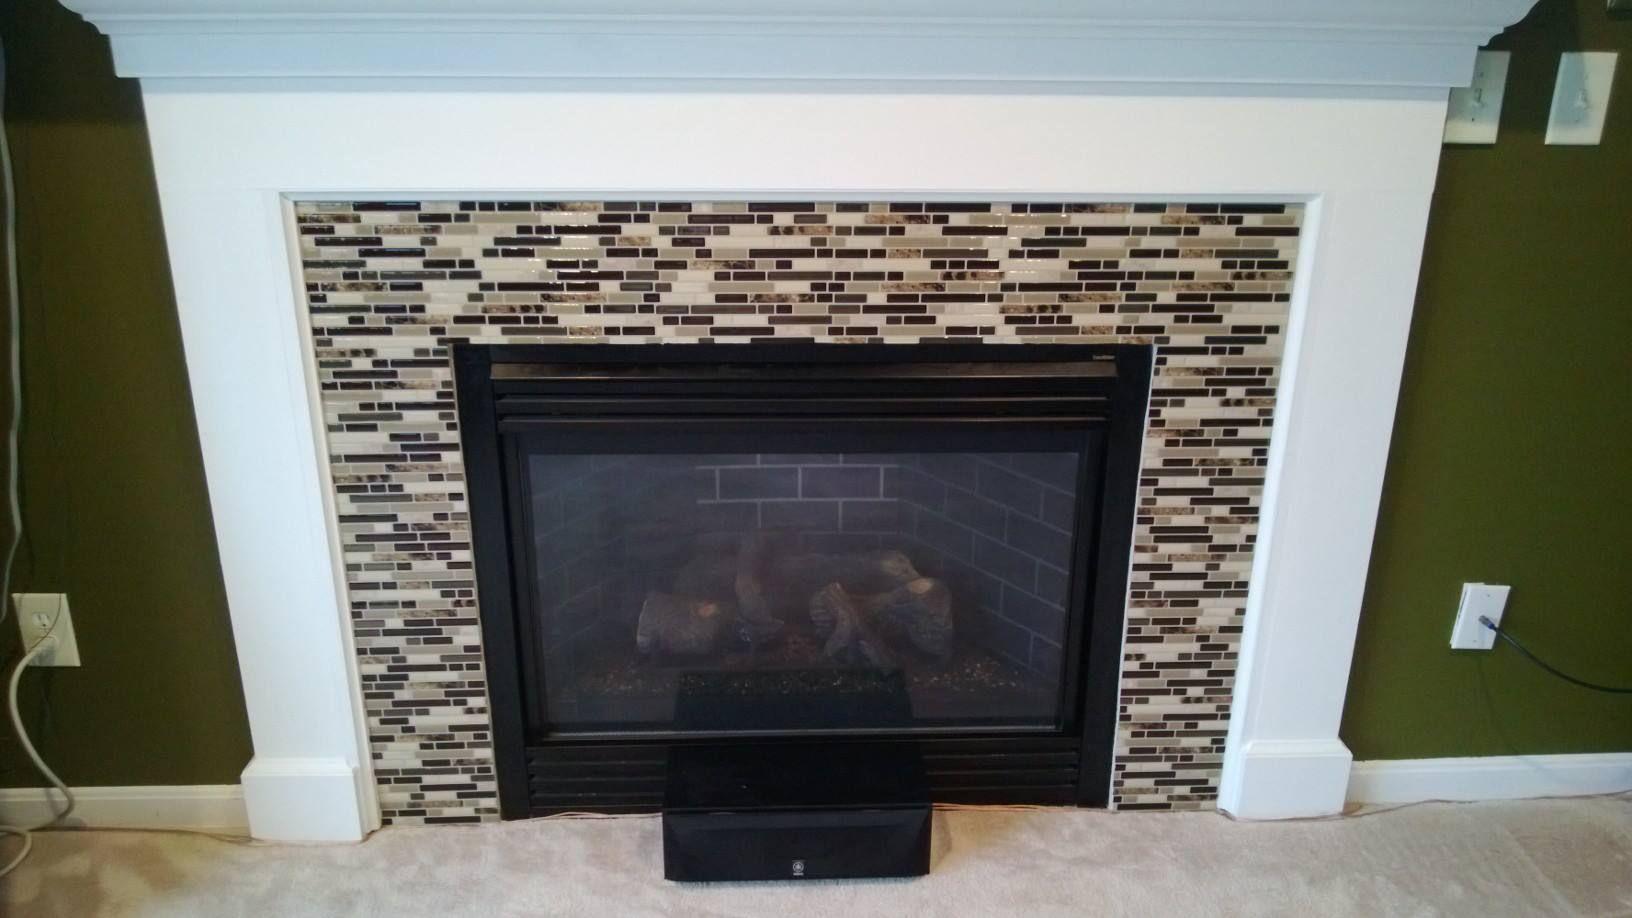 Do It Yourself Home Design: Peel And Stick Backsplash Fireplace